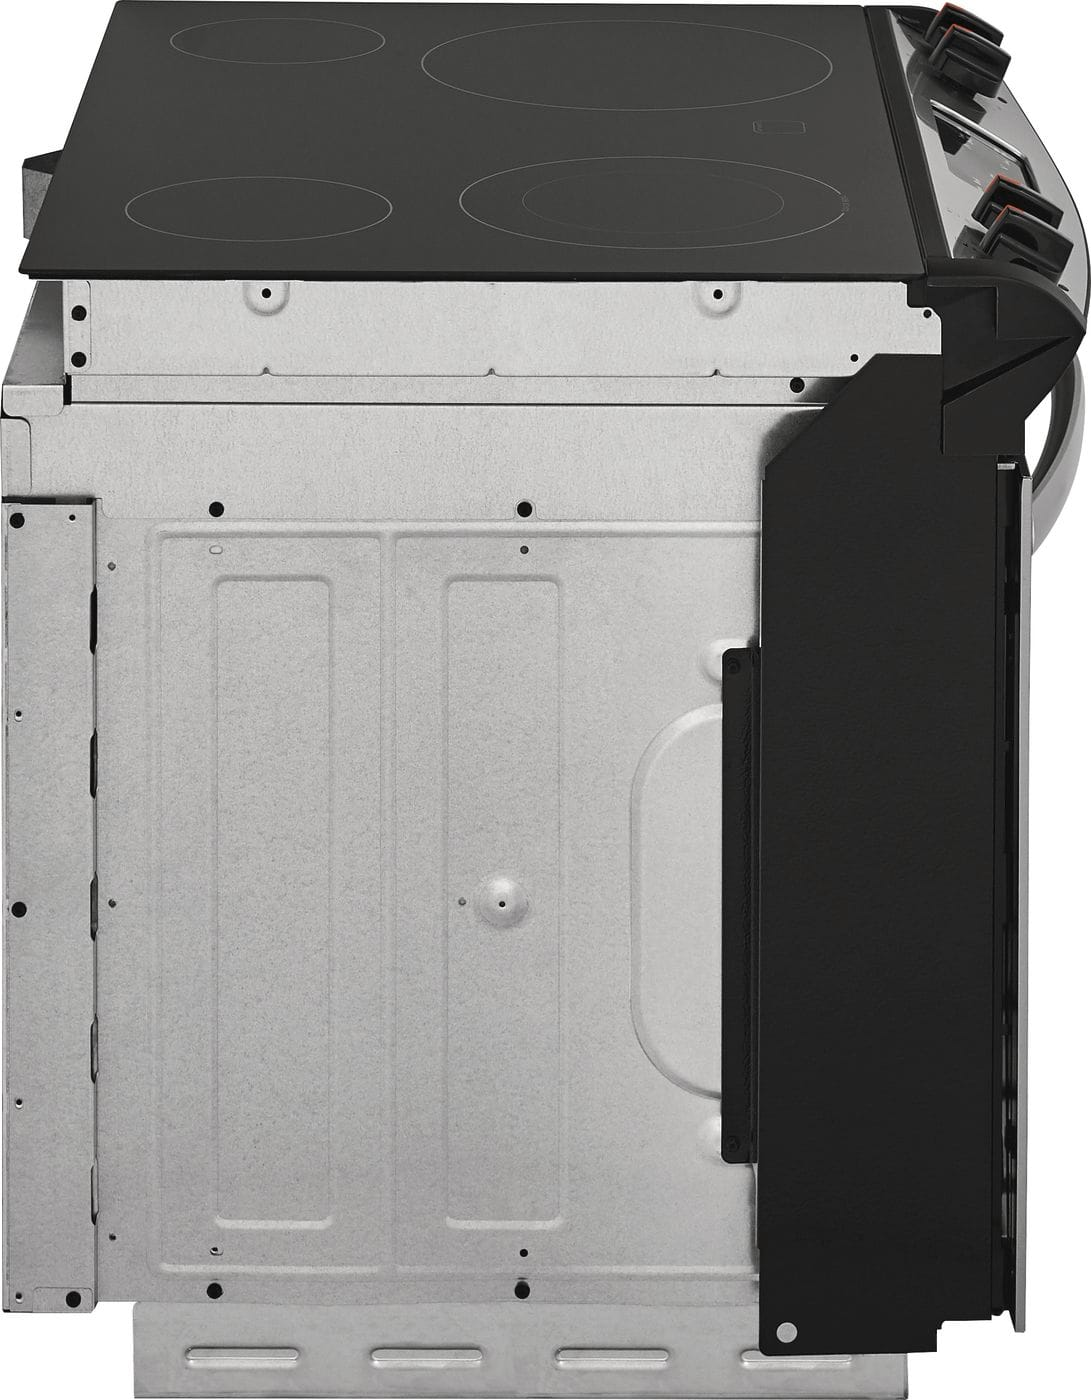 "Model: FFED3026TS | Frigidaire 30"" Drop-In Electric Range"